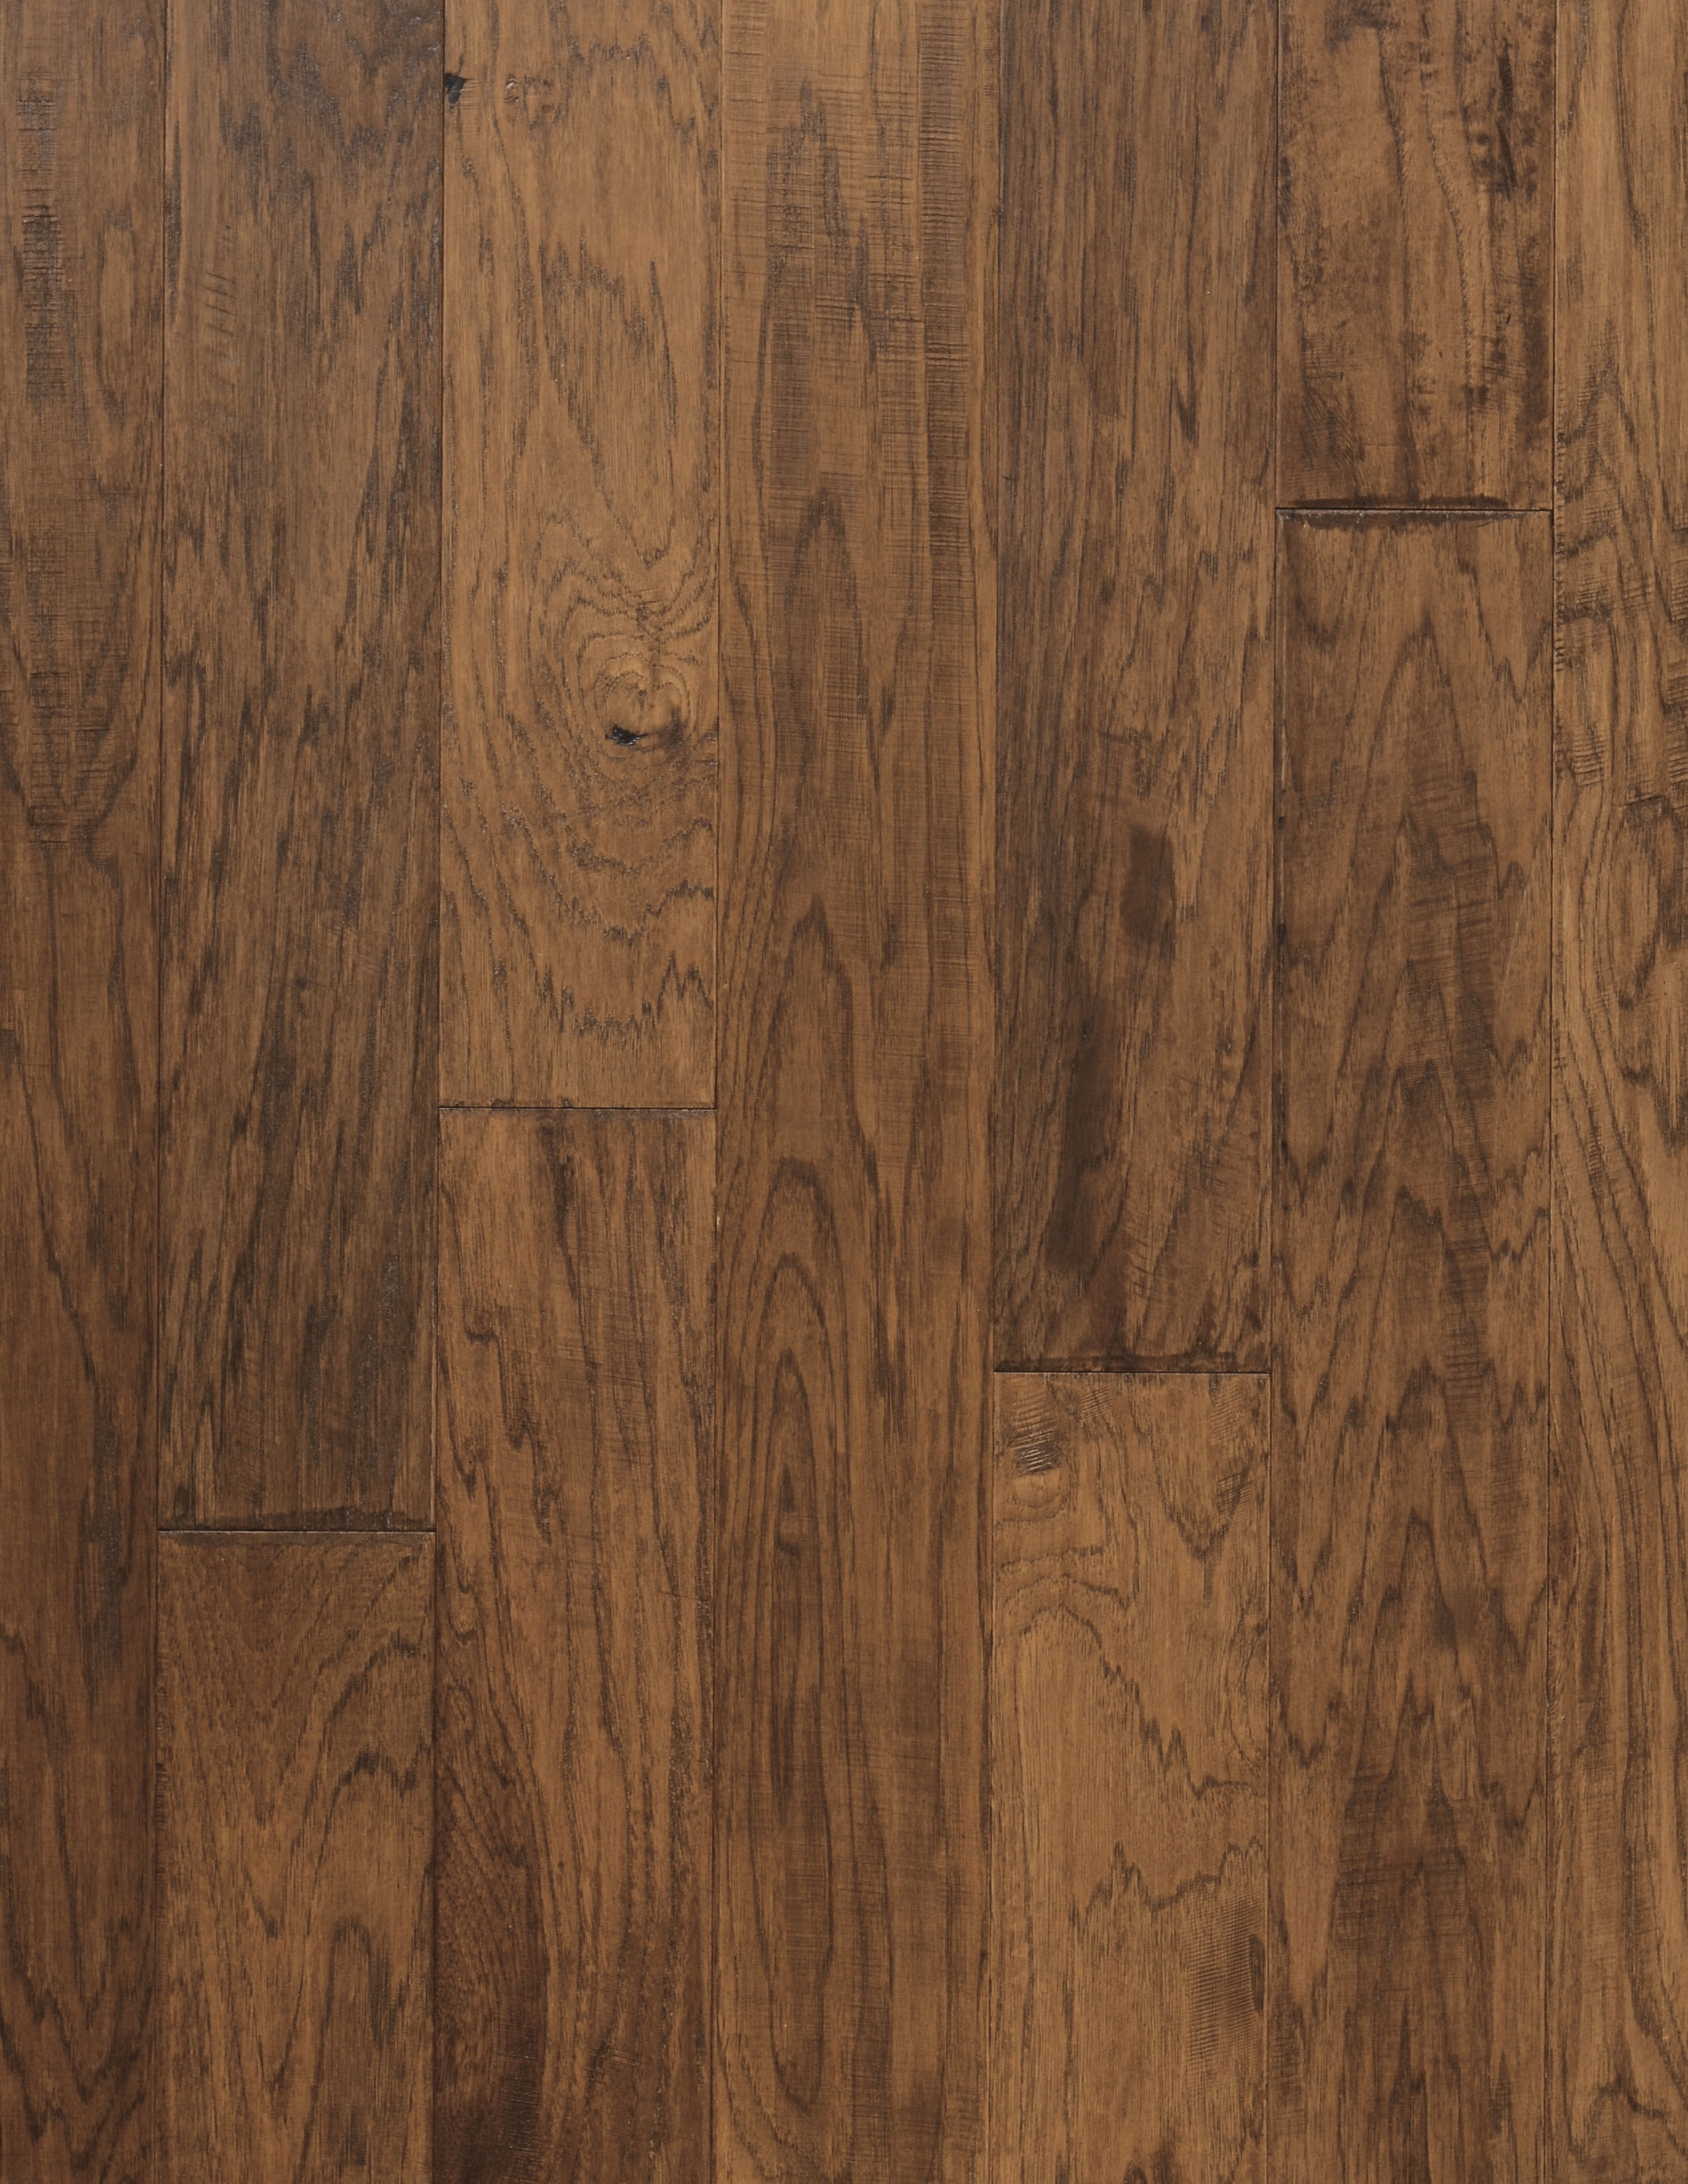 "Prairie / Hickory / 9 Coats UV Aluminum Oxide / ABCDE / 3/8"" x 5"" x R.L. Big Ass Wood Floors - Standbridge Collection 0"